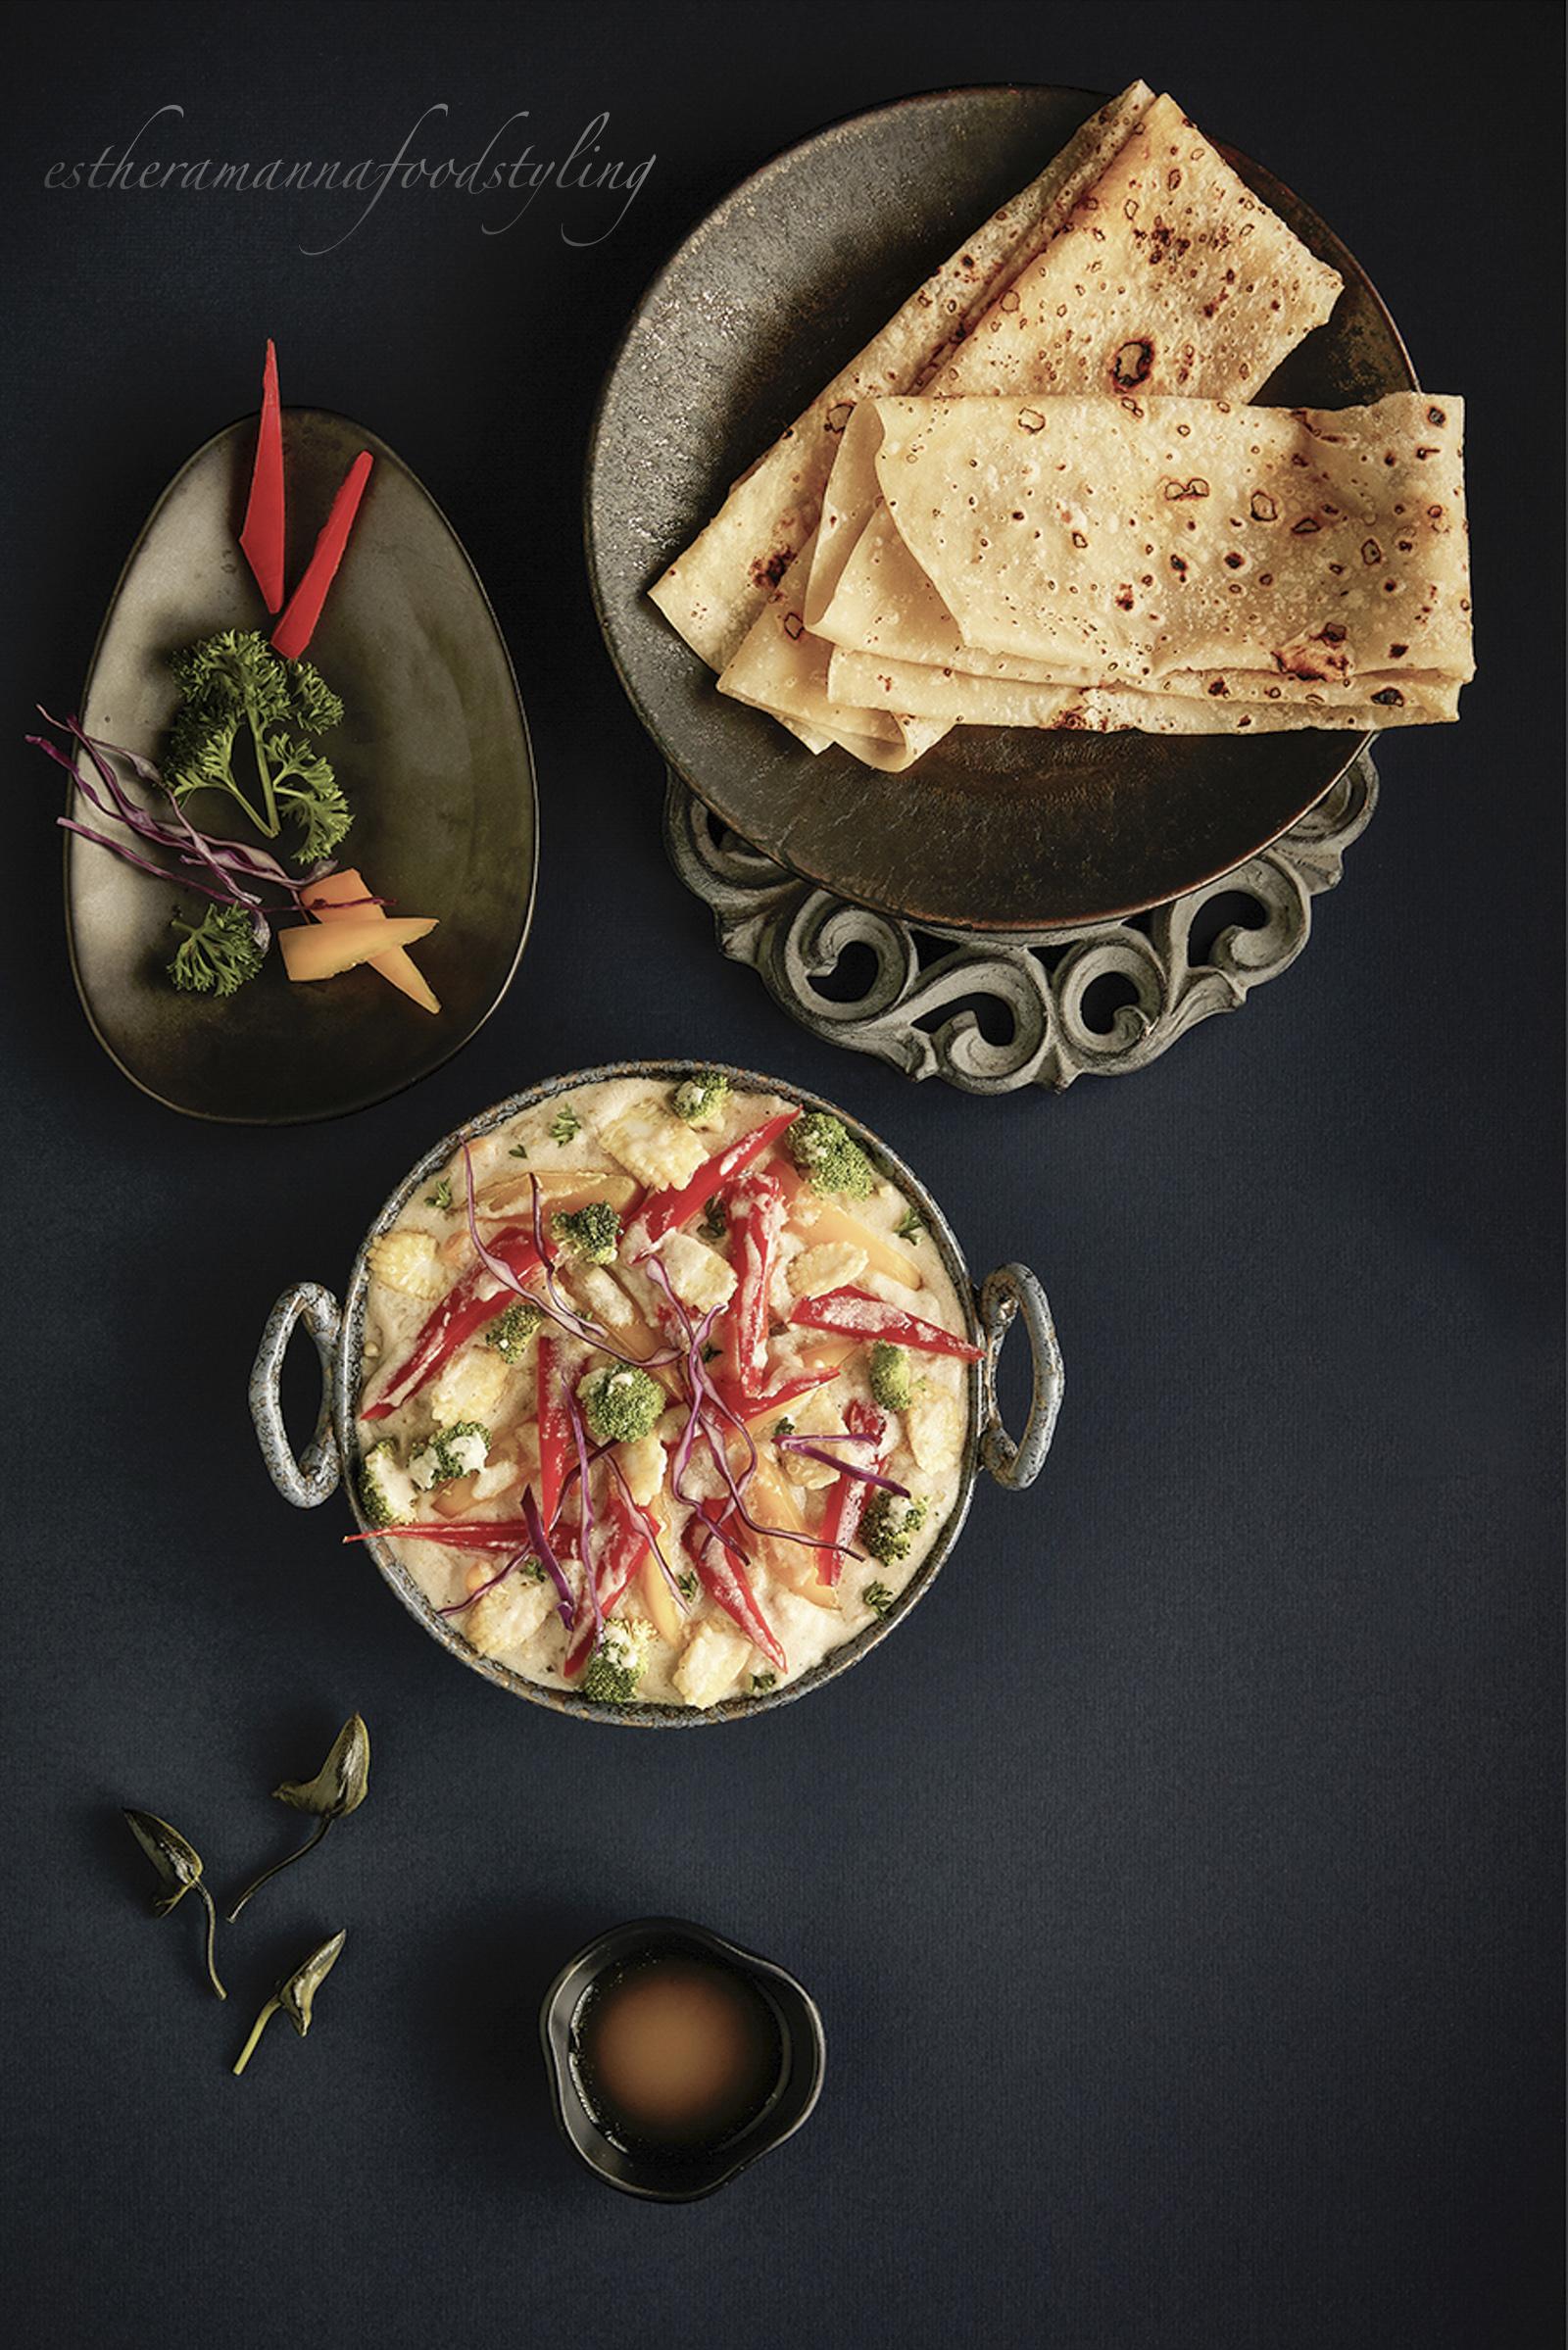 Indian cuisine,stir fried vegetables,rumali roti,textures,top shot,foodstylist